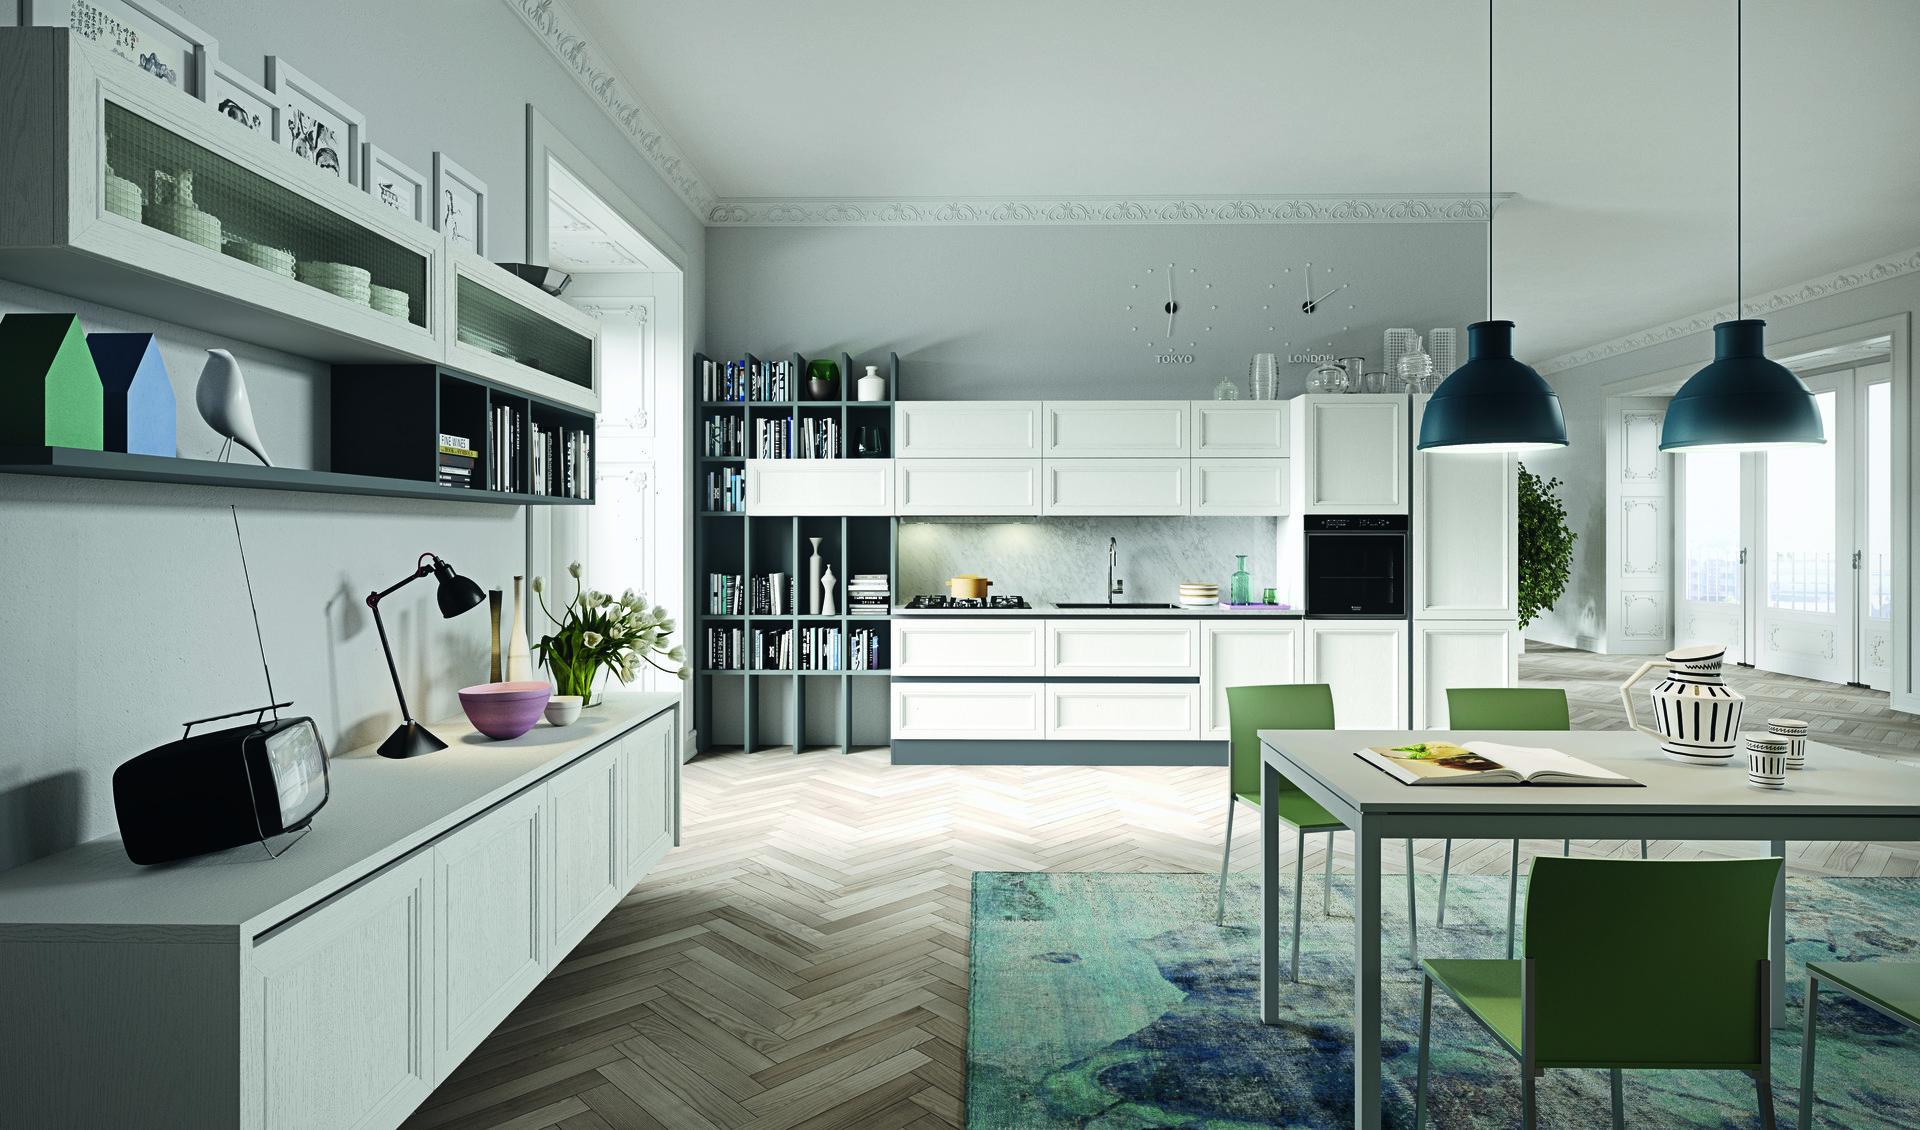 Beautiful Subito.it Arredamento Parma Photos - Home Design Ideas ...